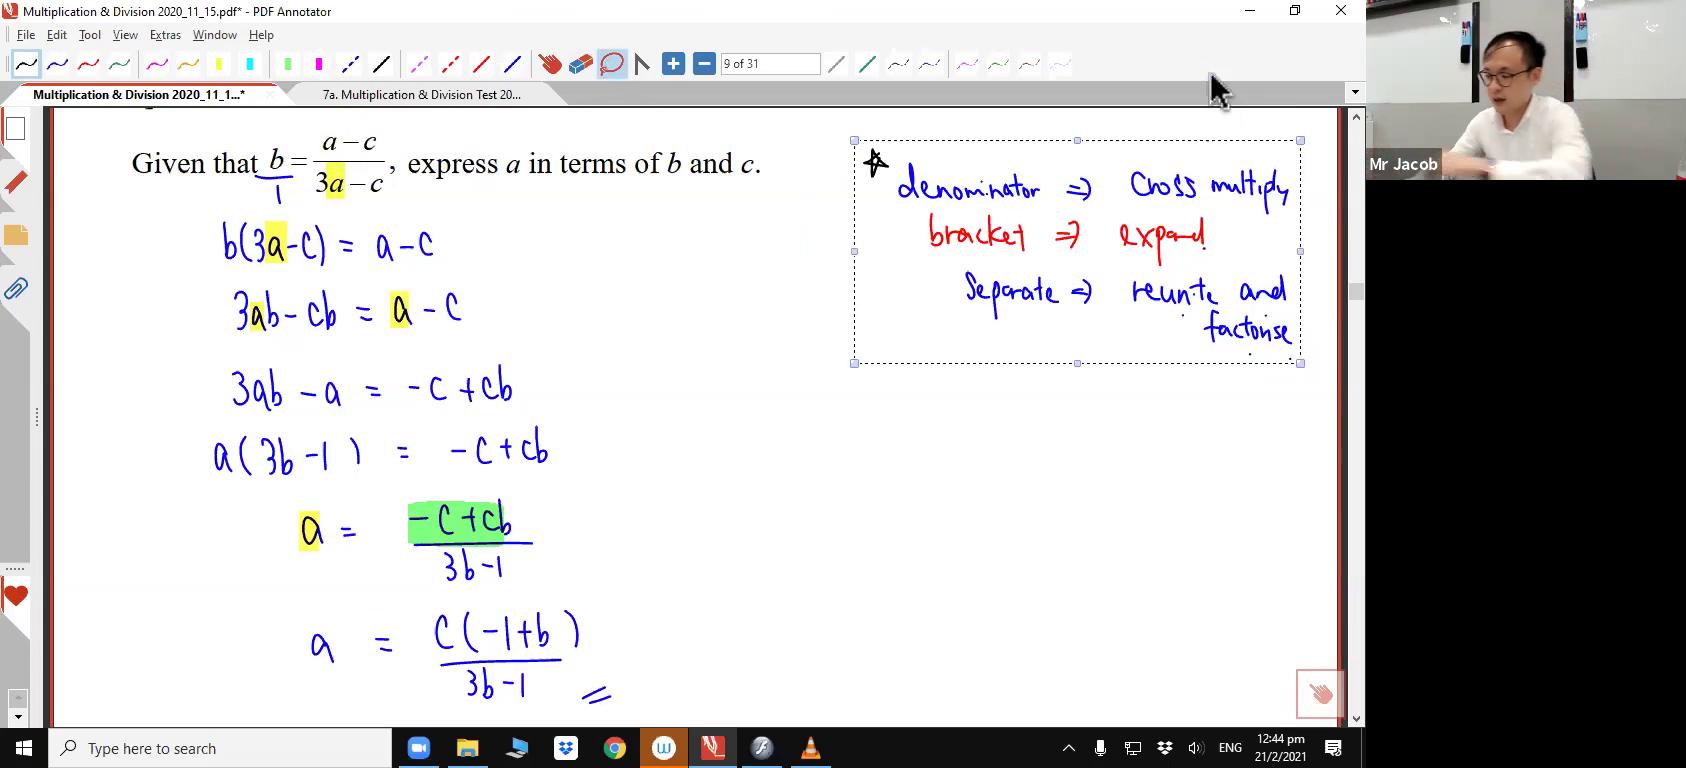 [ALGEBRAIC FRACTIONS] Changing Subject of Formula